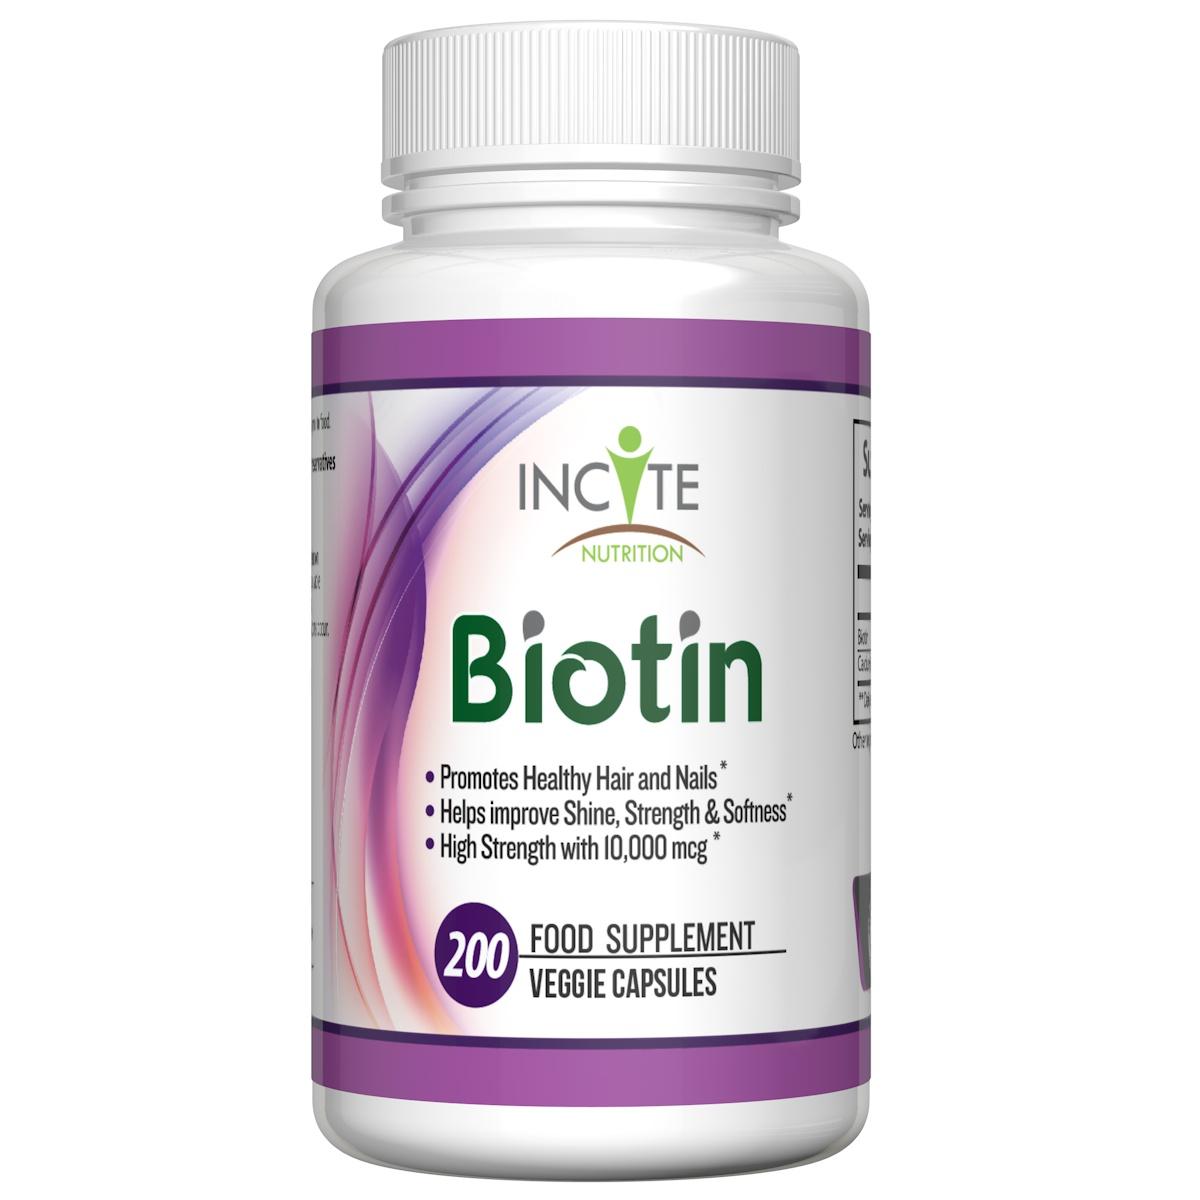 Biotin Hair & Nail Vitamin by #incitenutrition